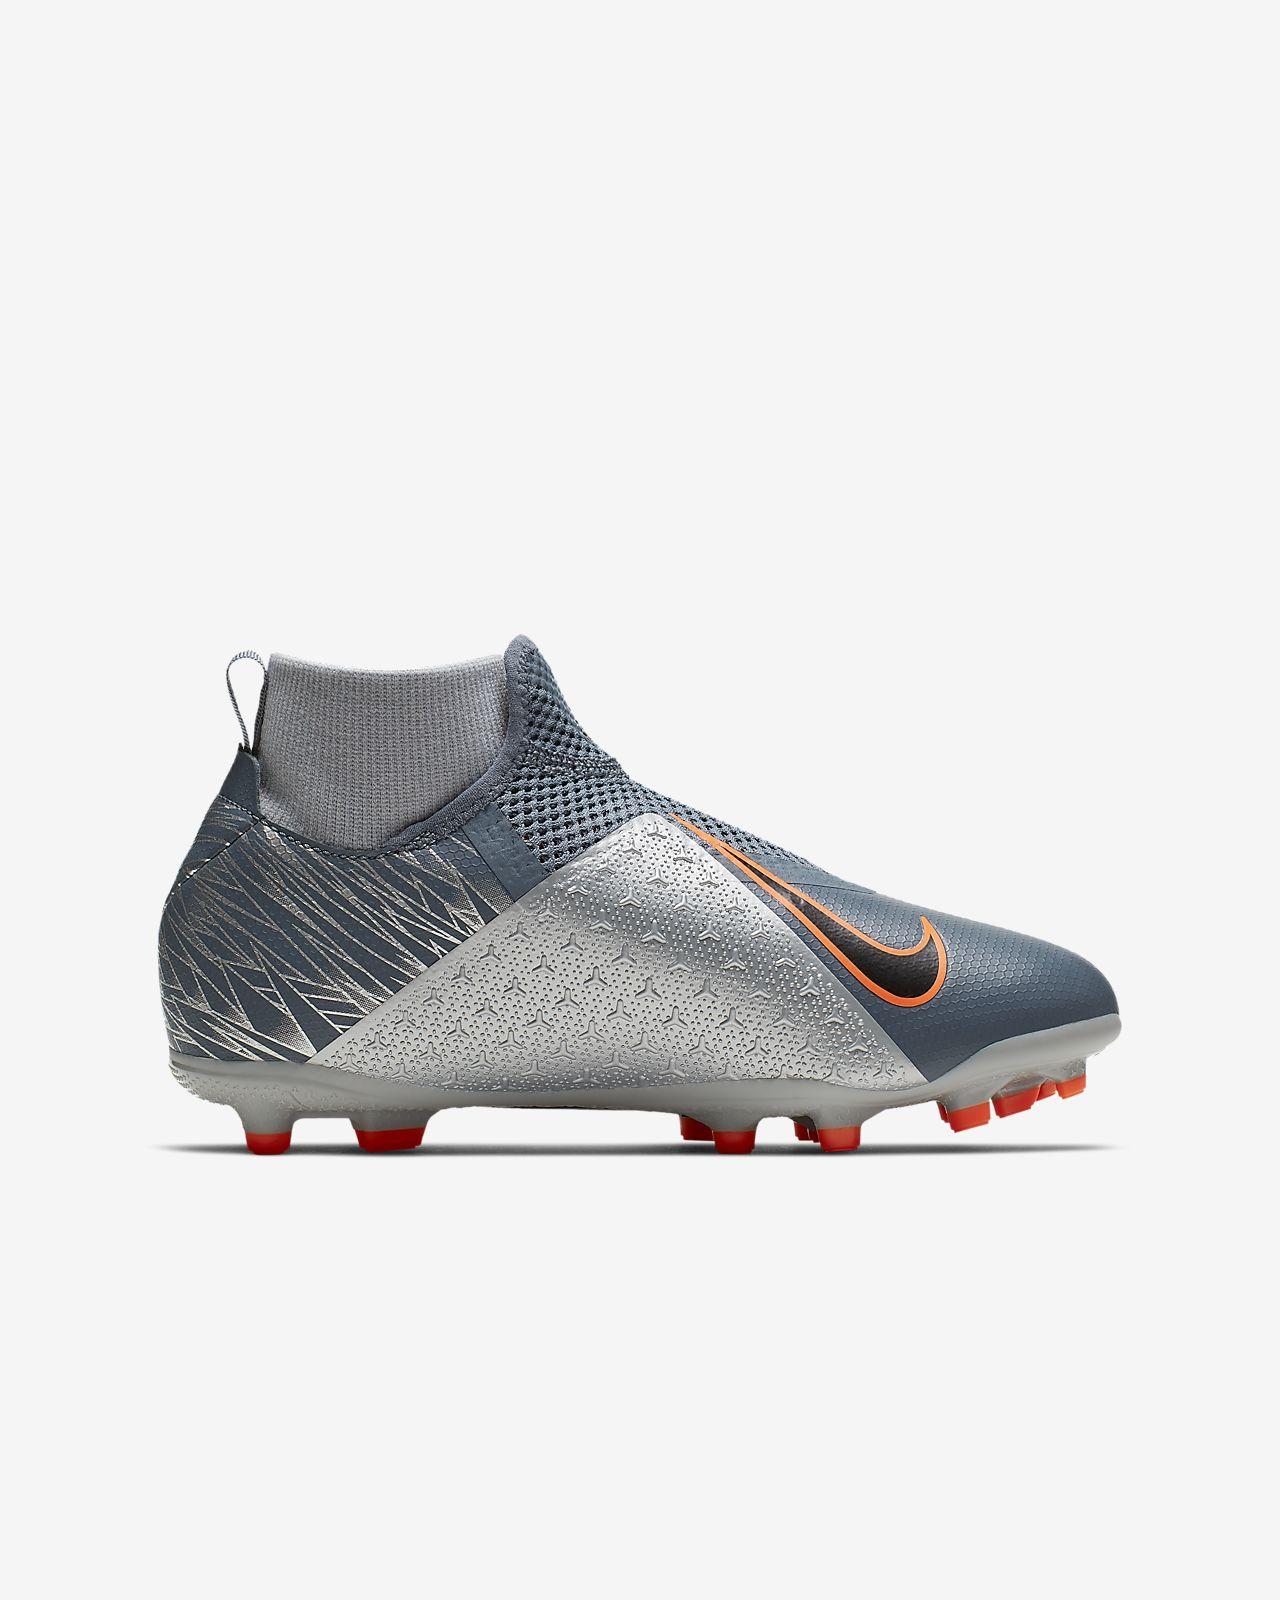 best service 68adf 827f8 ... Scarpa da calcio multiterreno Nike Jr. Phantom Vision Academy Dynamic  Fit MG - Bambini/